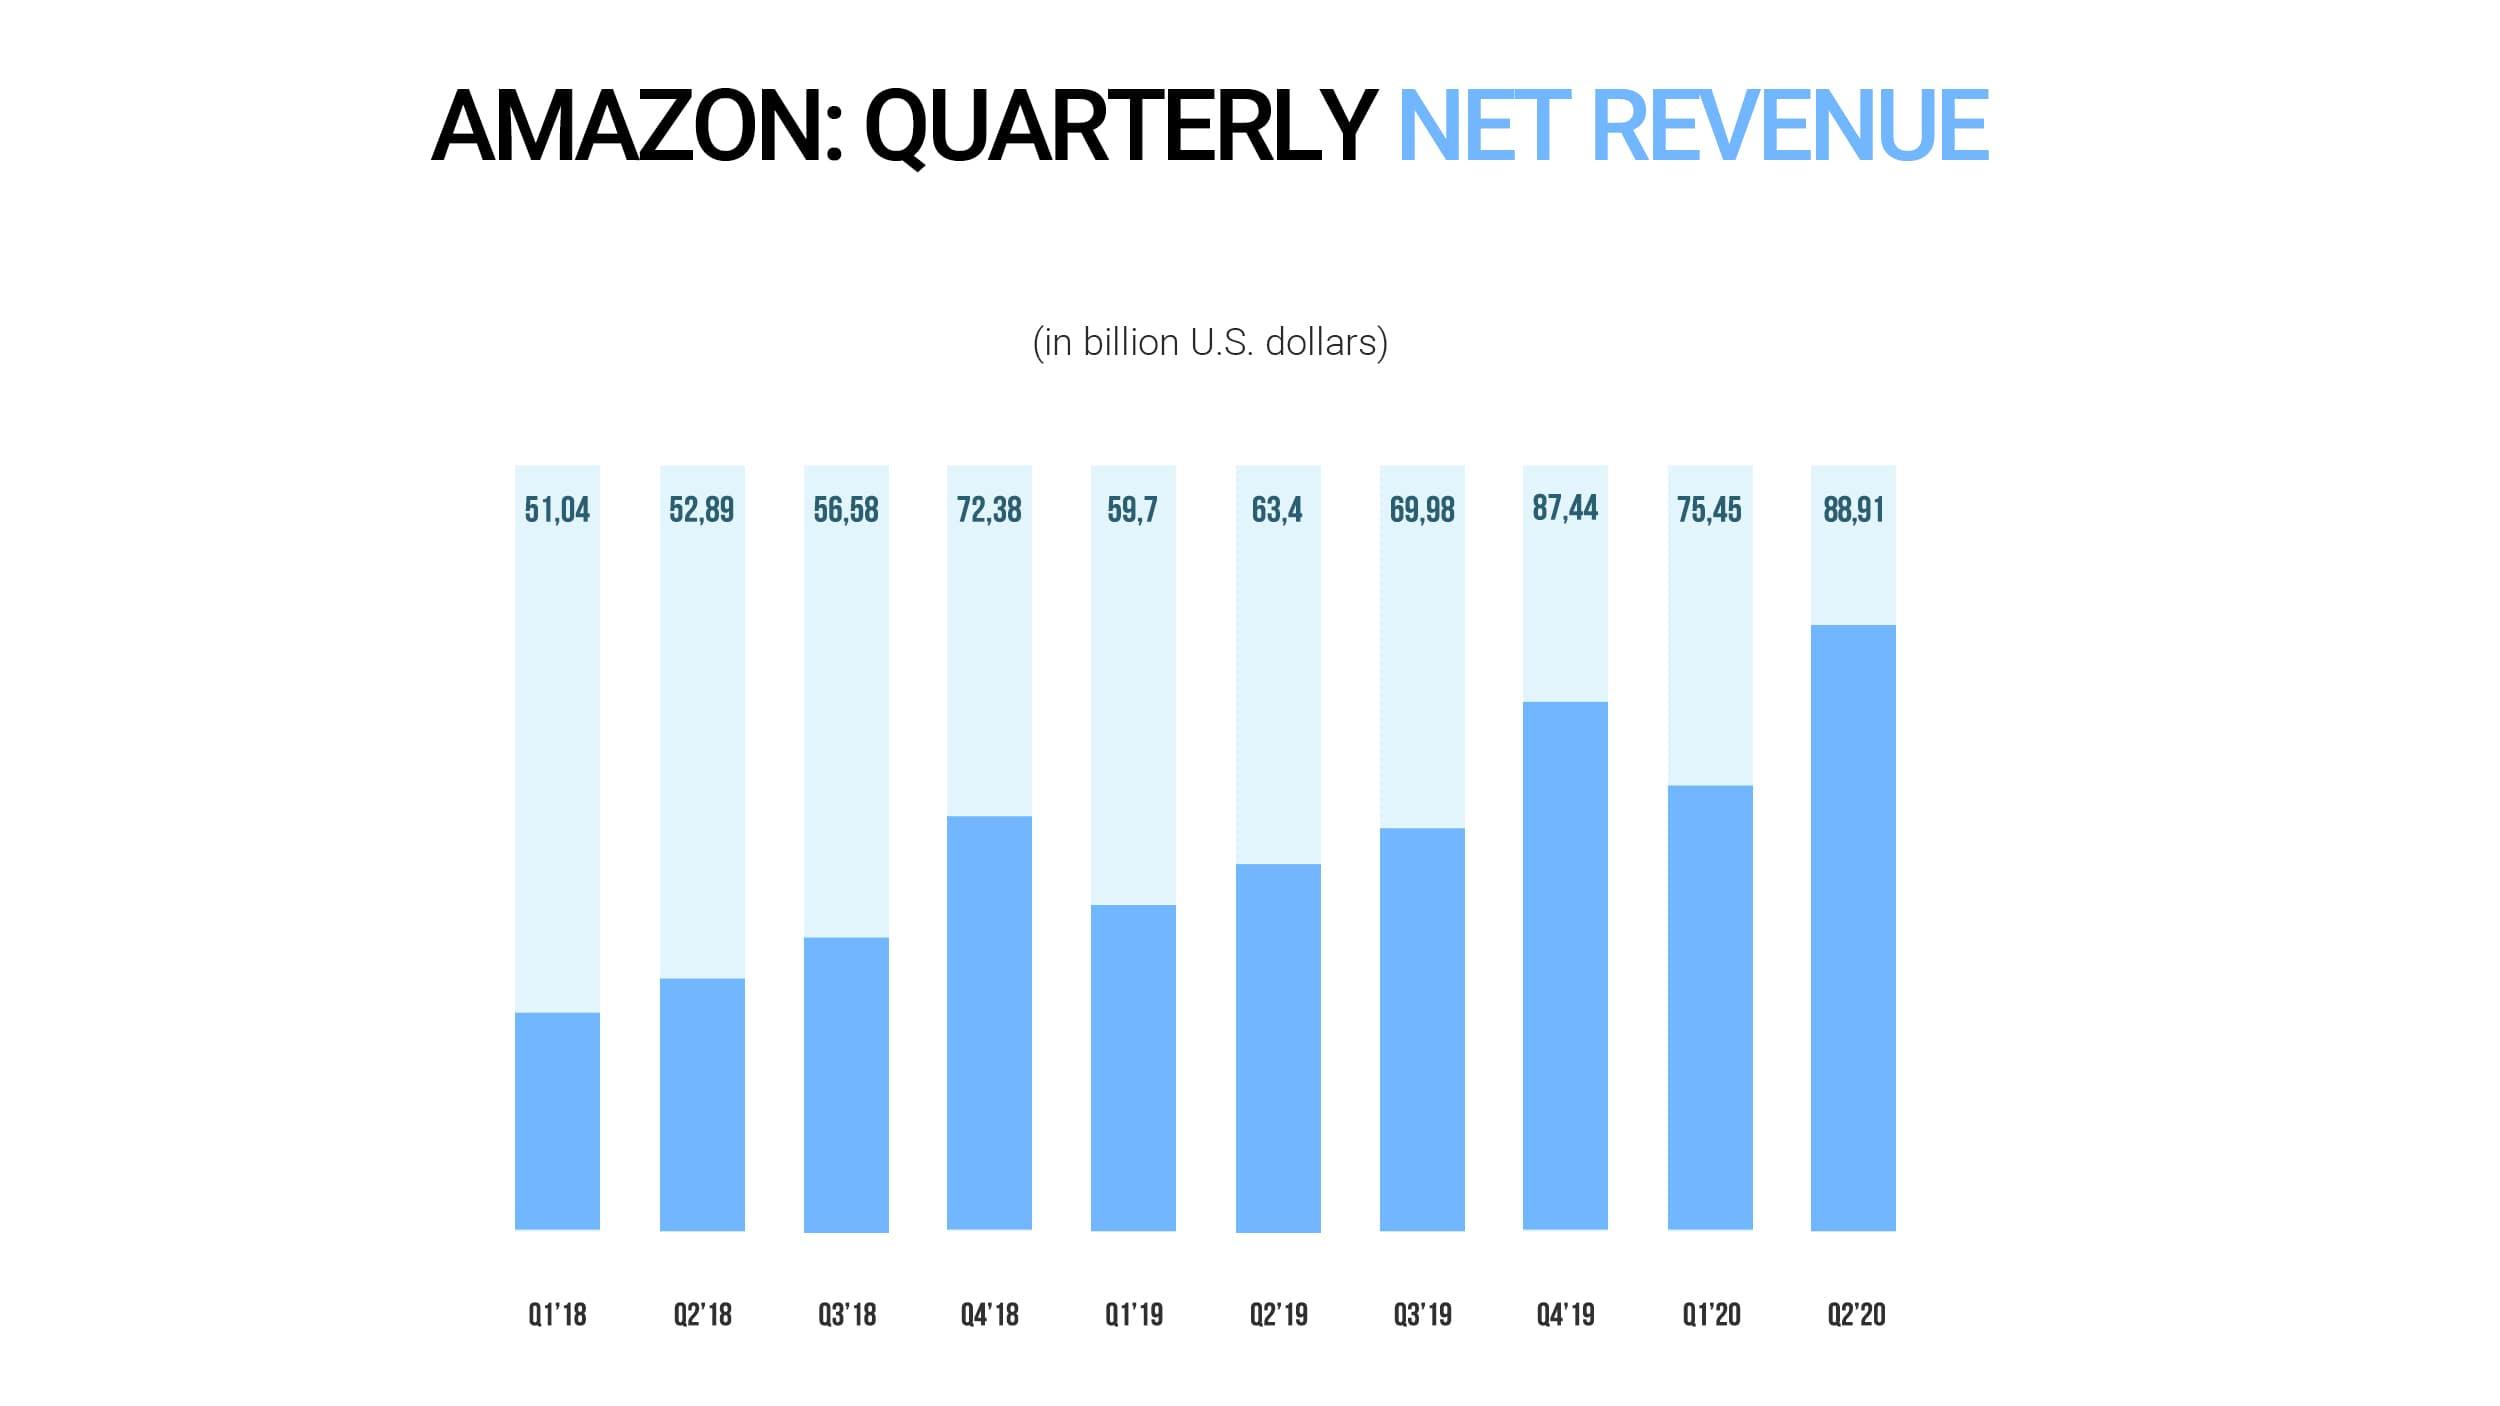 Amazon quarterly net revenue 20018-2020